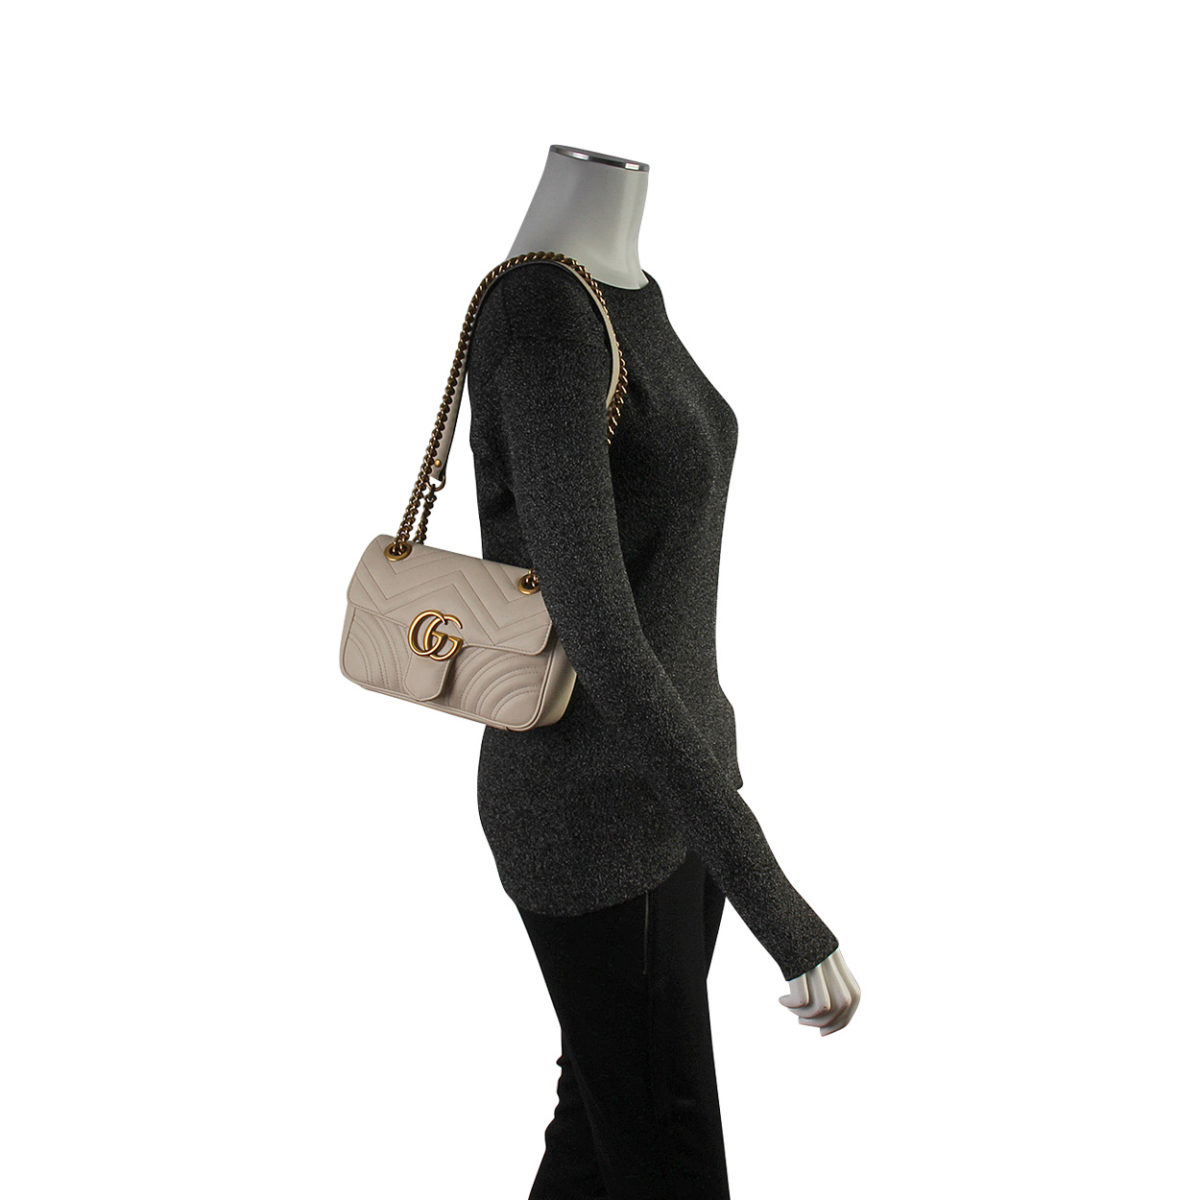 Gucci Black GG Marmont Small Matelasse Shoulder Bag